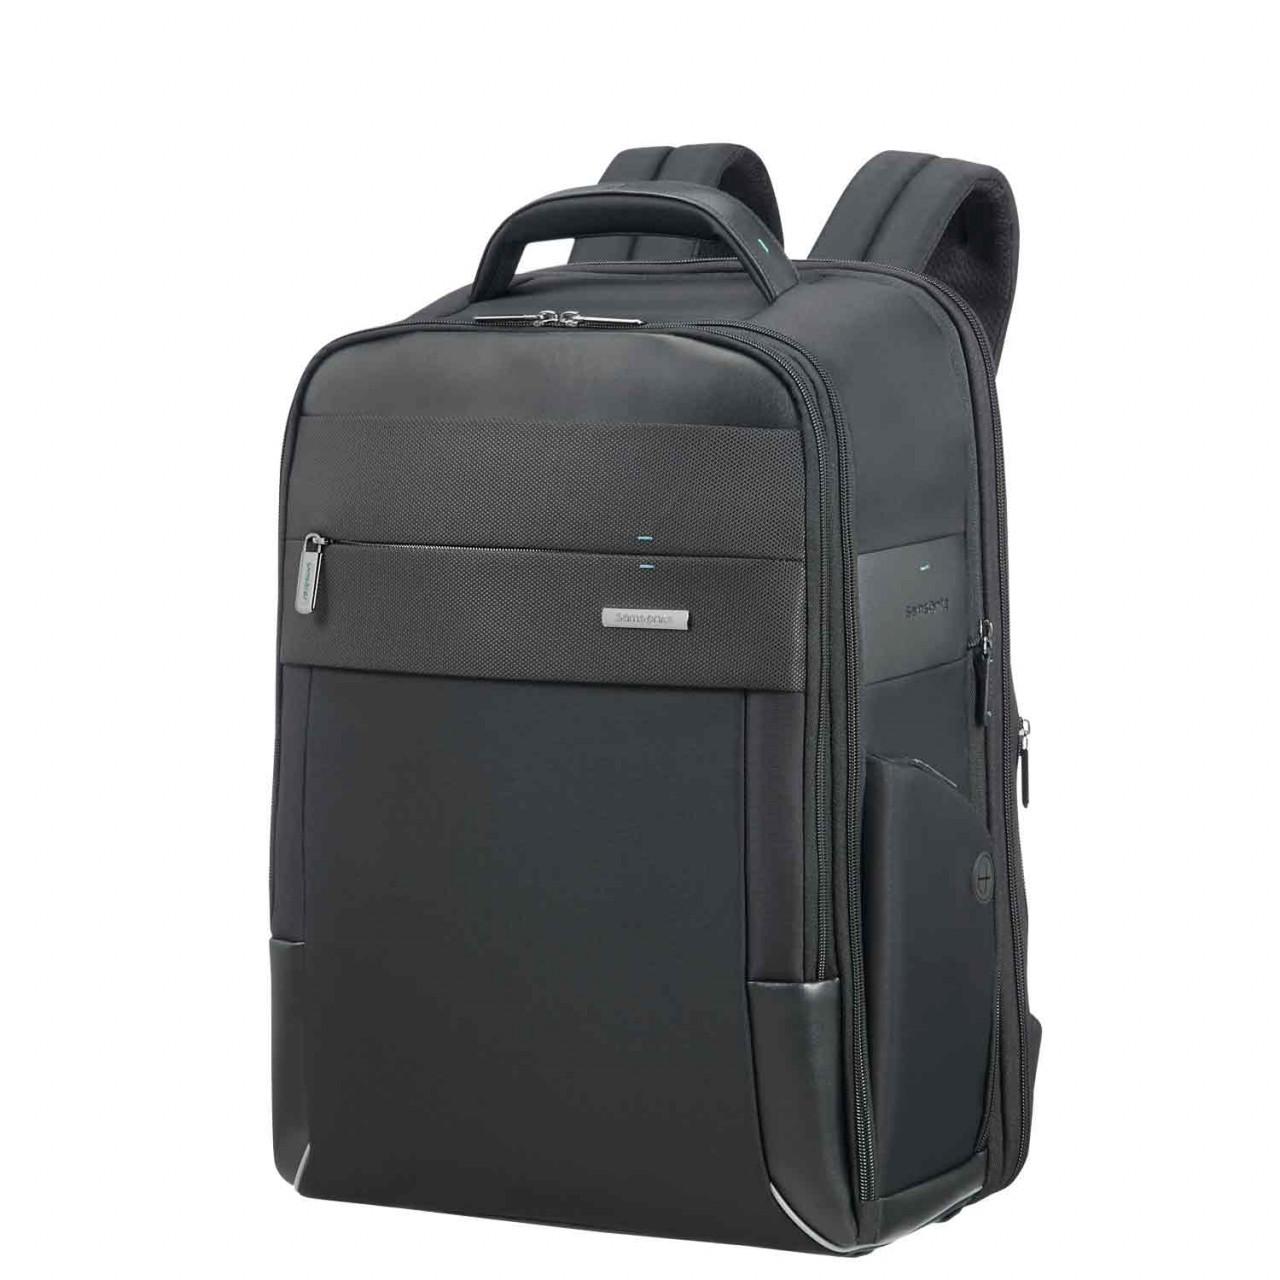 "Samsonite Laptoprucksack Backpack 17.3"" EXP Spectrolite 2.0 black"